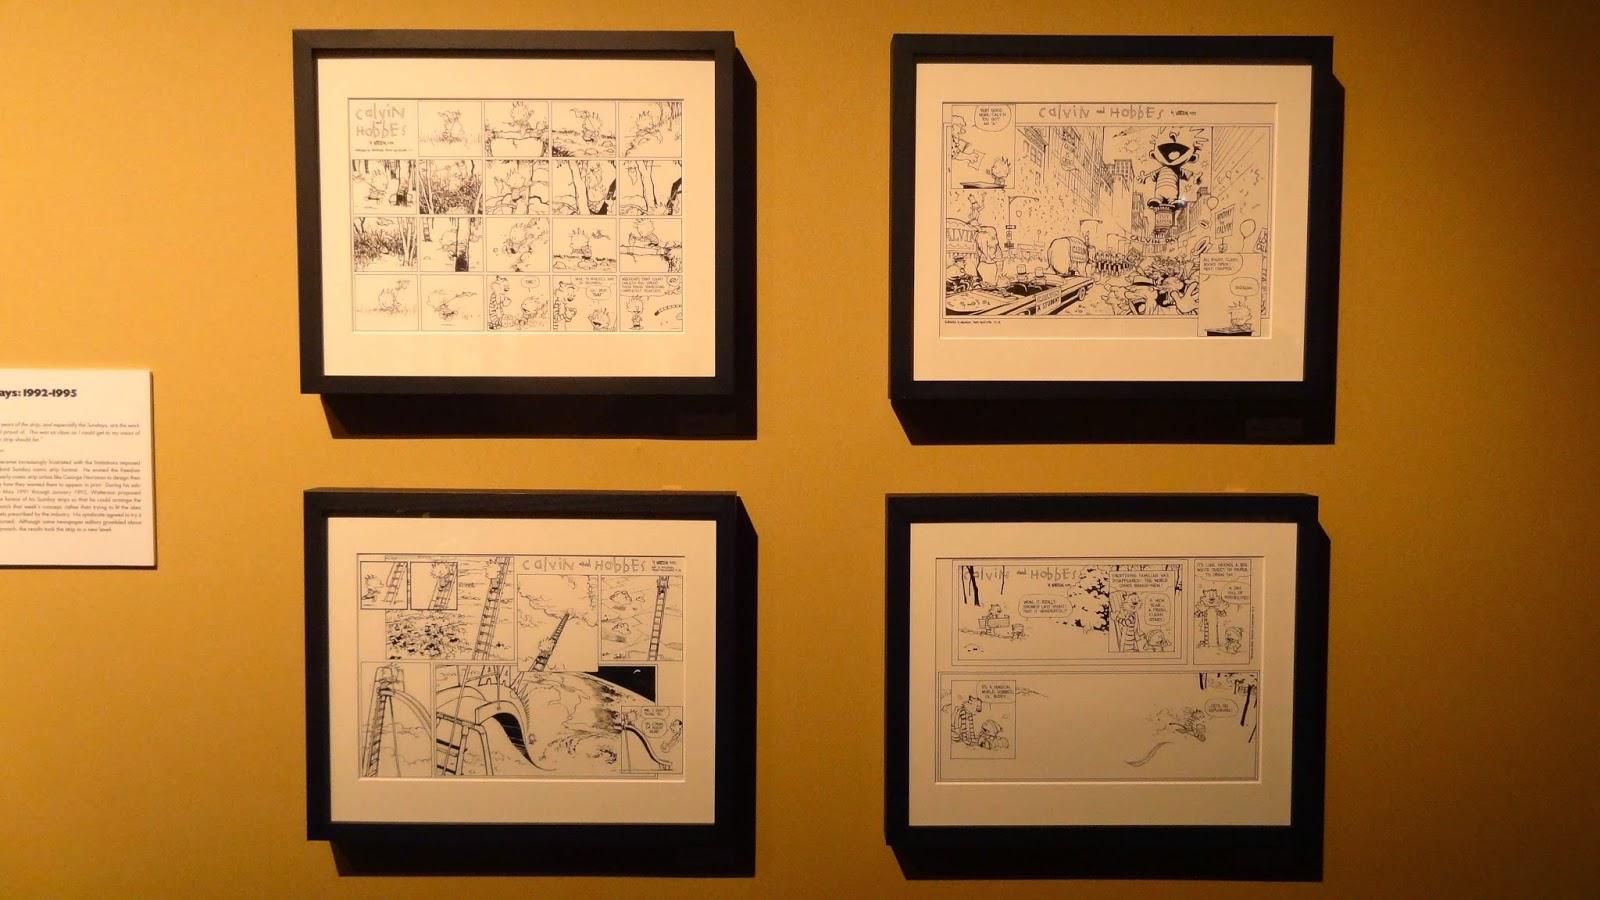 Expo Watterson Calvin et Hobbes, Angoulême FIBD 2015, Les derniers strips